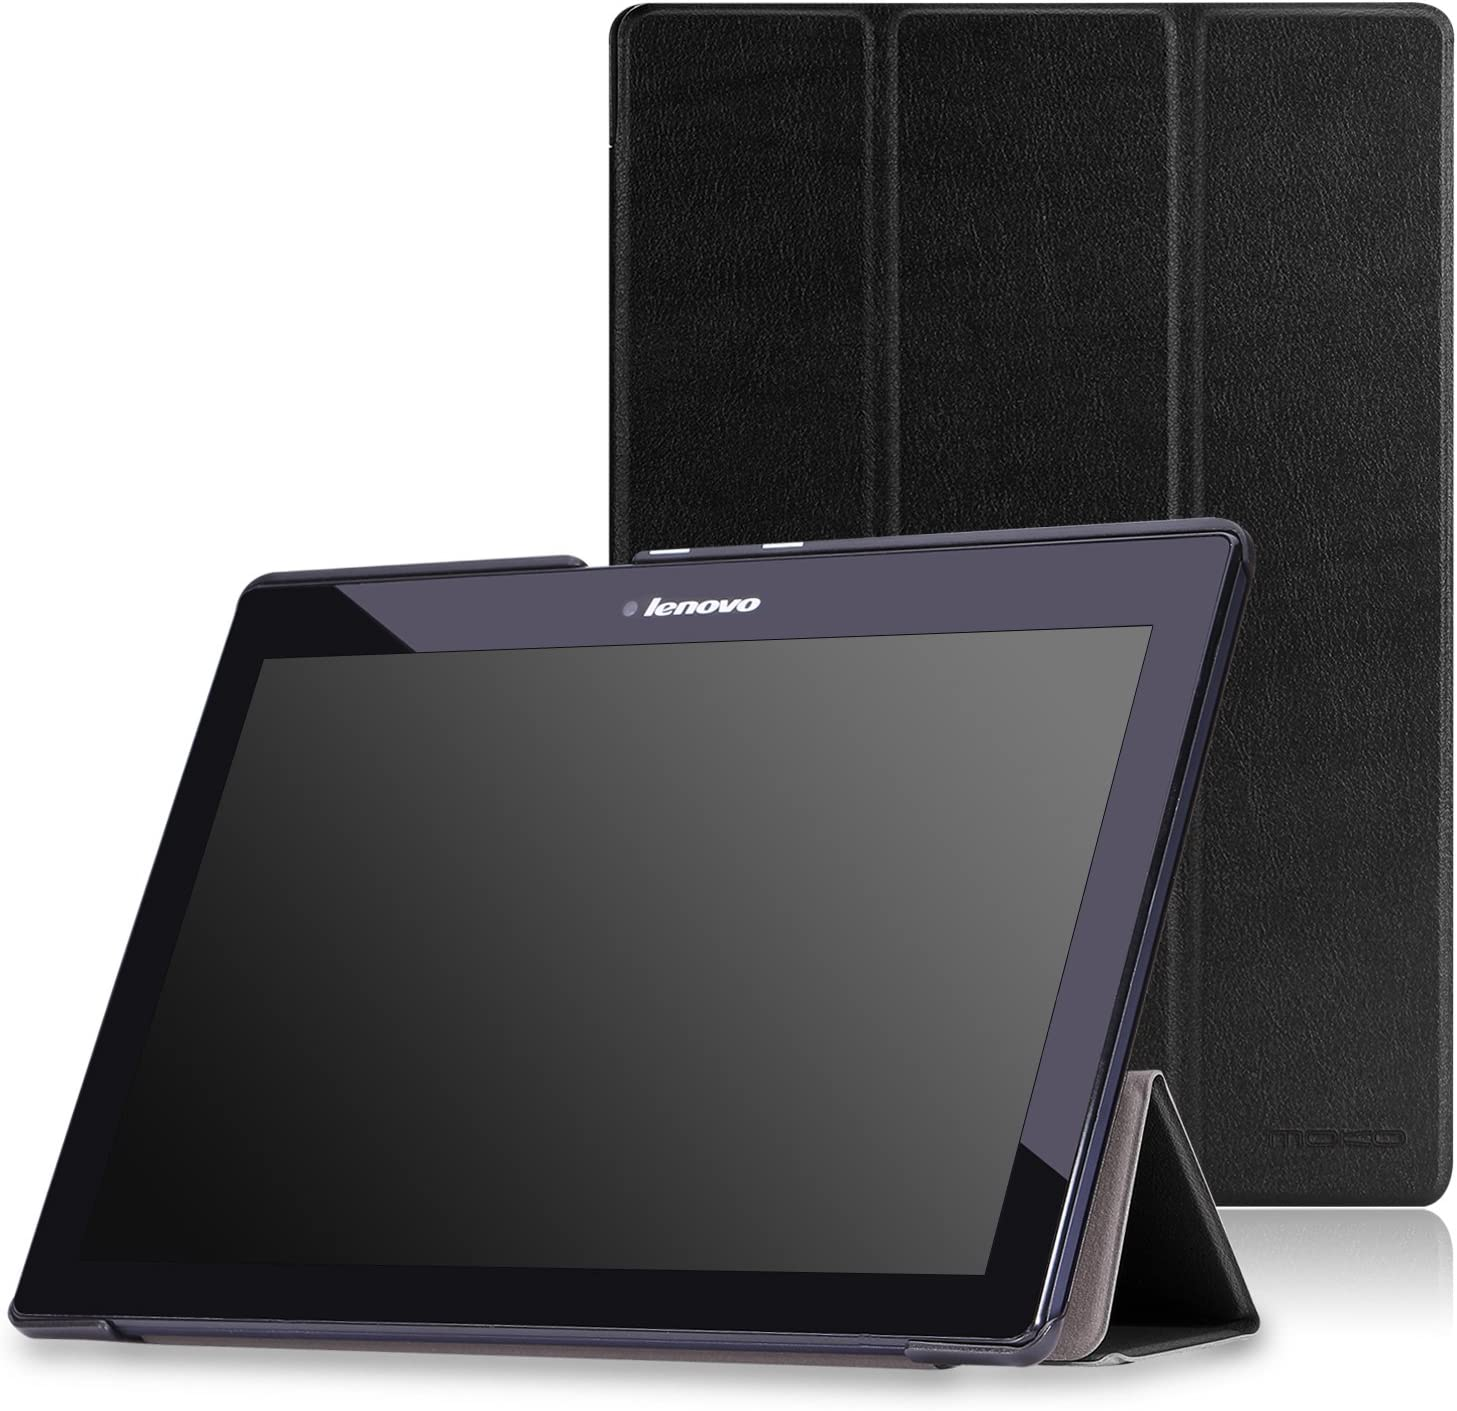 MoKo Lenovo Tab2 A10-70 Case - Ultra Lightweight Smart Slim Shell Stand Cover Case for Lenovo Tab 2 A10-70, Tab 10(TB-X103F) 10.1 inch Tablet, Black